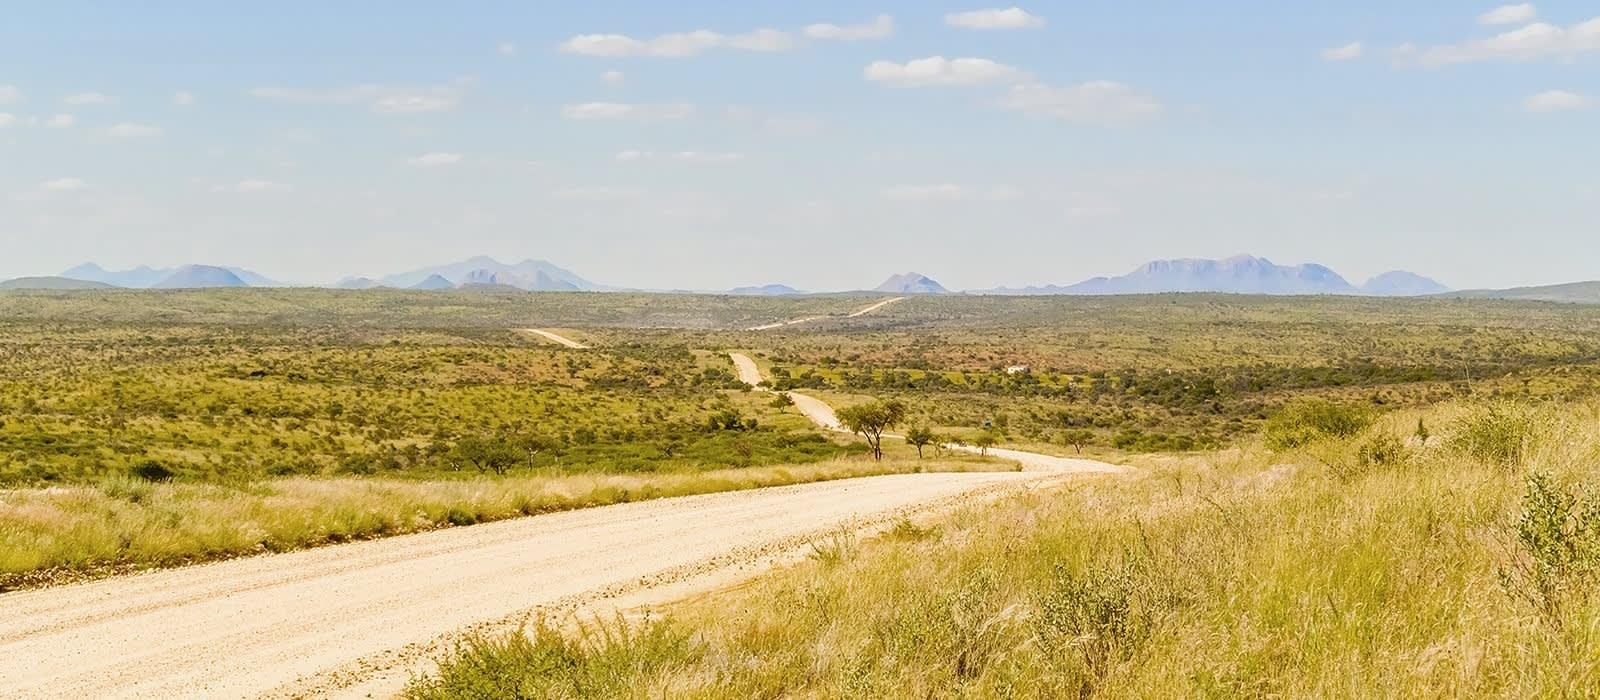 Staubiger Highway in Windhoek, Namibia